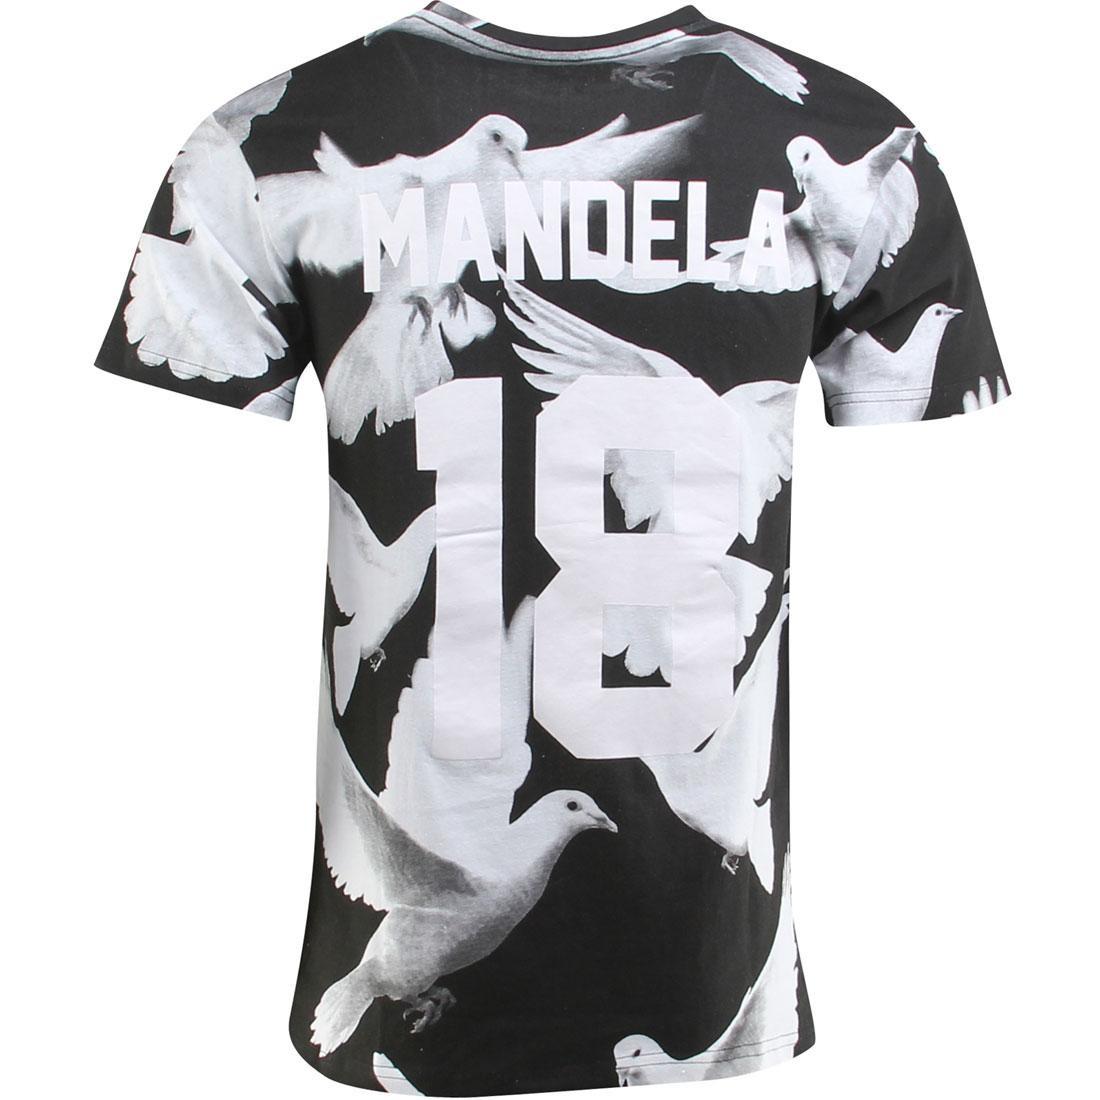 Tシャツ メンズファッション トップス カットソー メンズ 【 Eleven Paris Mandela Tee (black / Olombe Print) 】 Black / Olombe Print